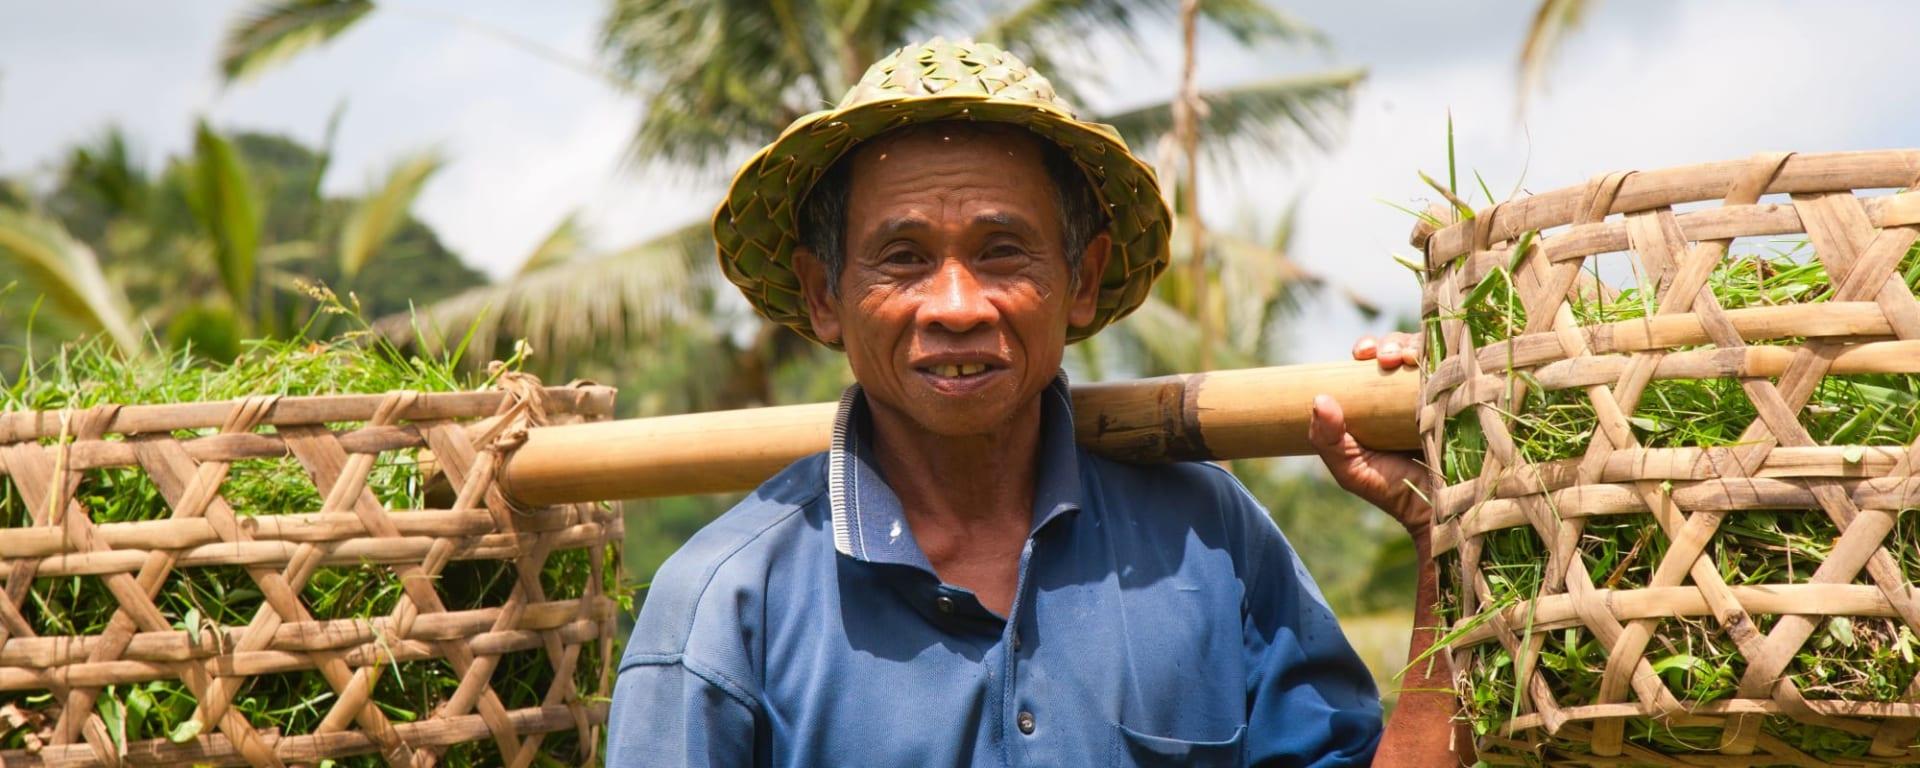 Soft Adventure Bali ab Süd-Bali: Indonesien Bali Reisfarmer